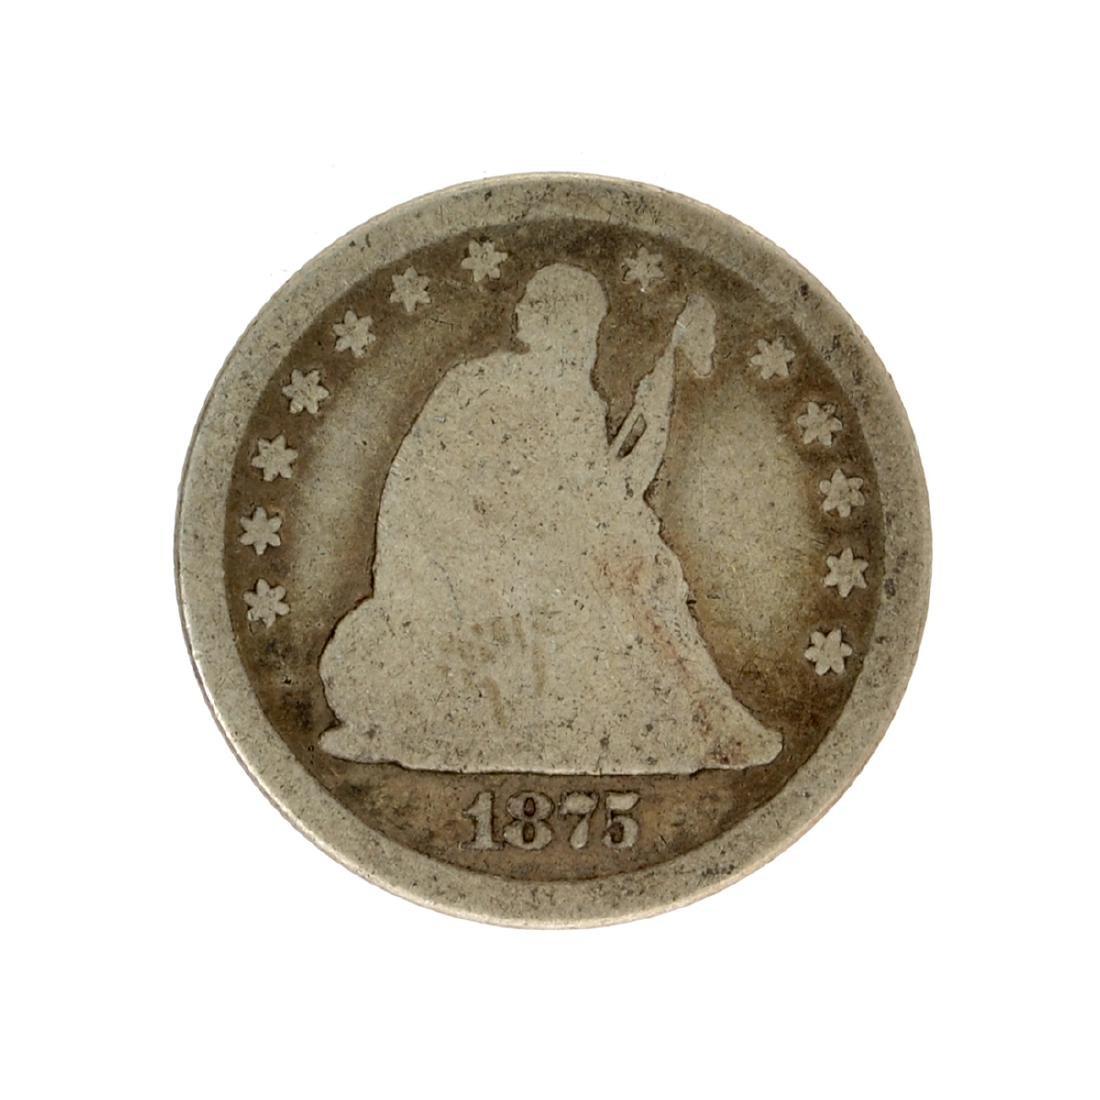 1875 Liberty Seated Quarter Dollar Coin